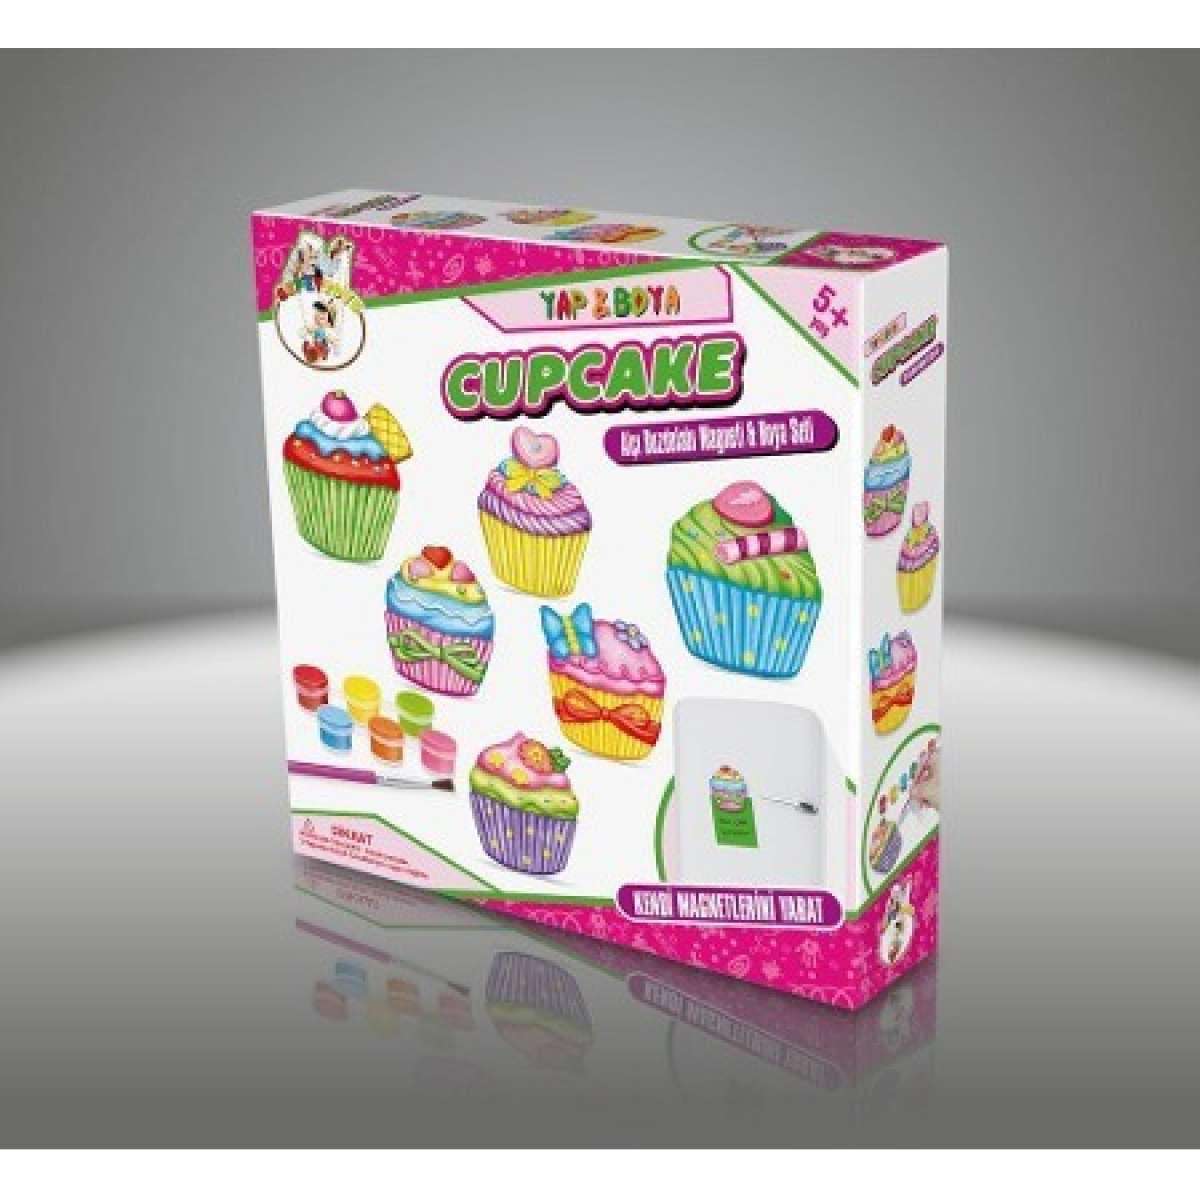 Yap Boya Cup Cake Magnet